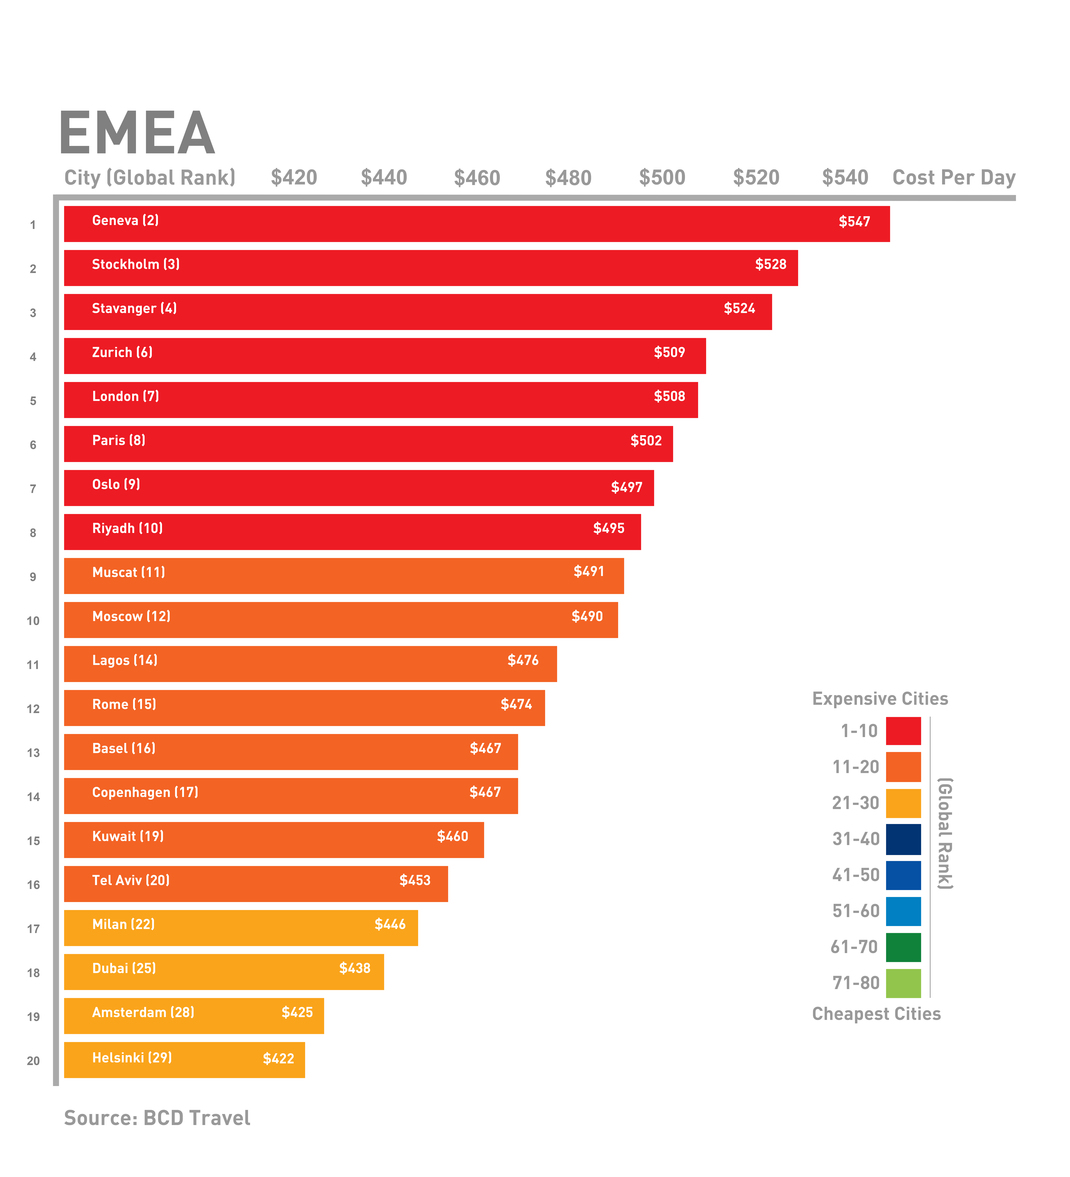 EMEA business travel costs